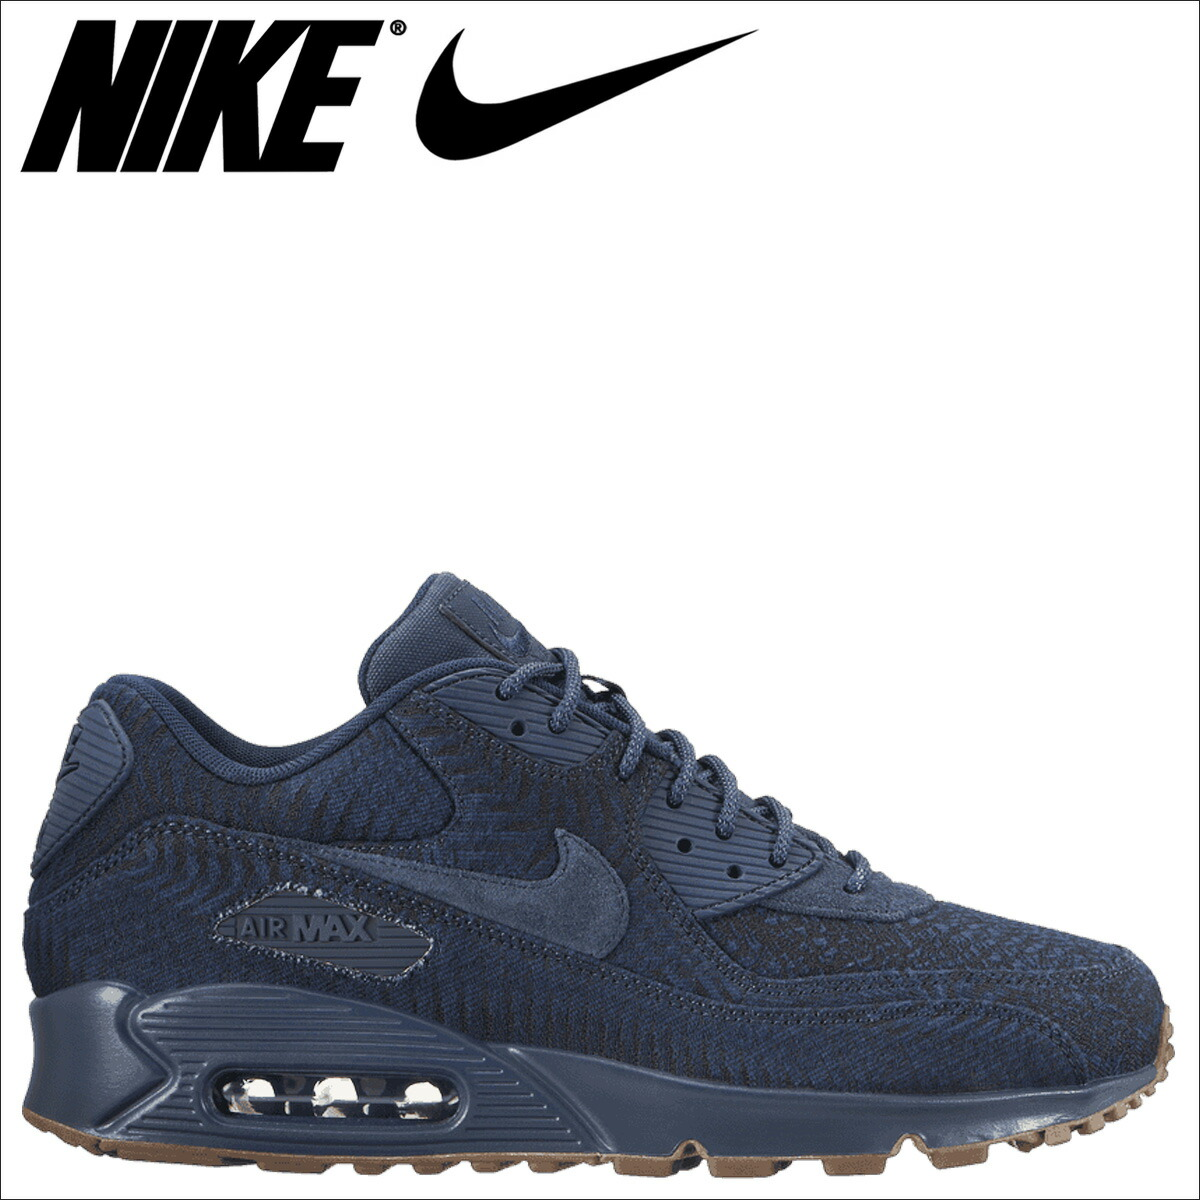 Nike Air Max 90 Premium Jacquard Shoes Indigo Navy 918358